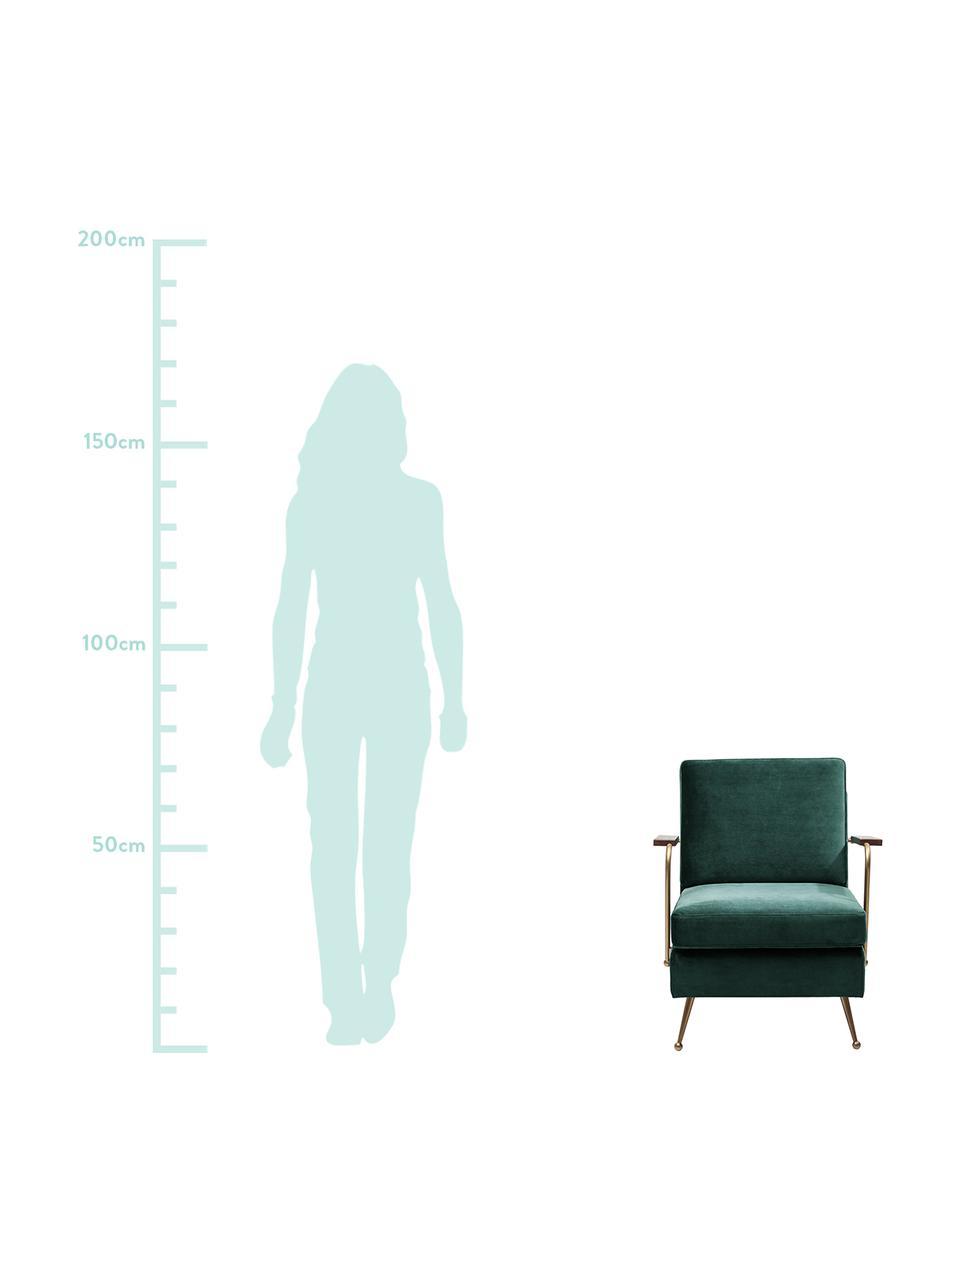 Sedia a poltrona in velluto Gamble, Velluto verde, Larg.. 68 x Prof. 75 cm